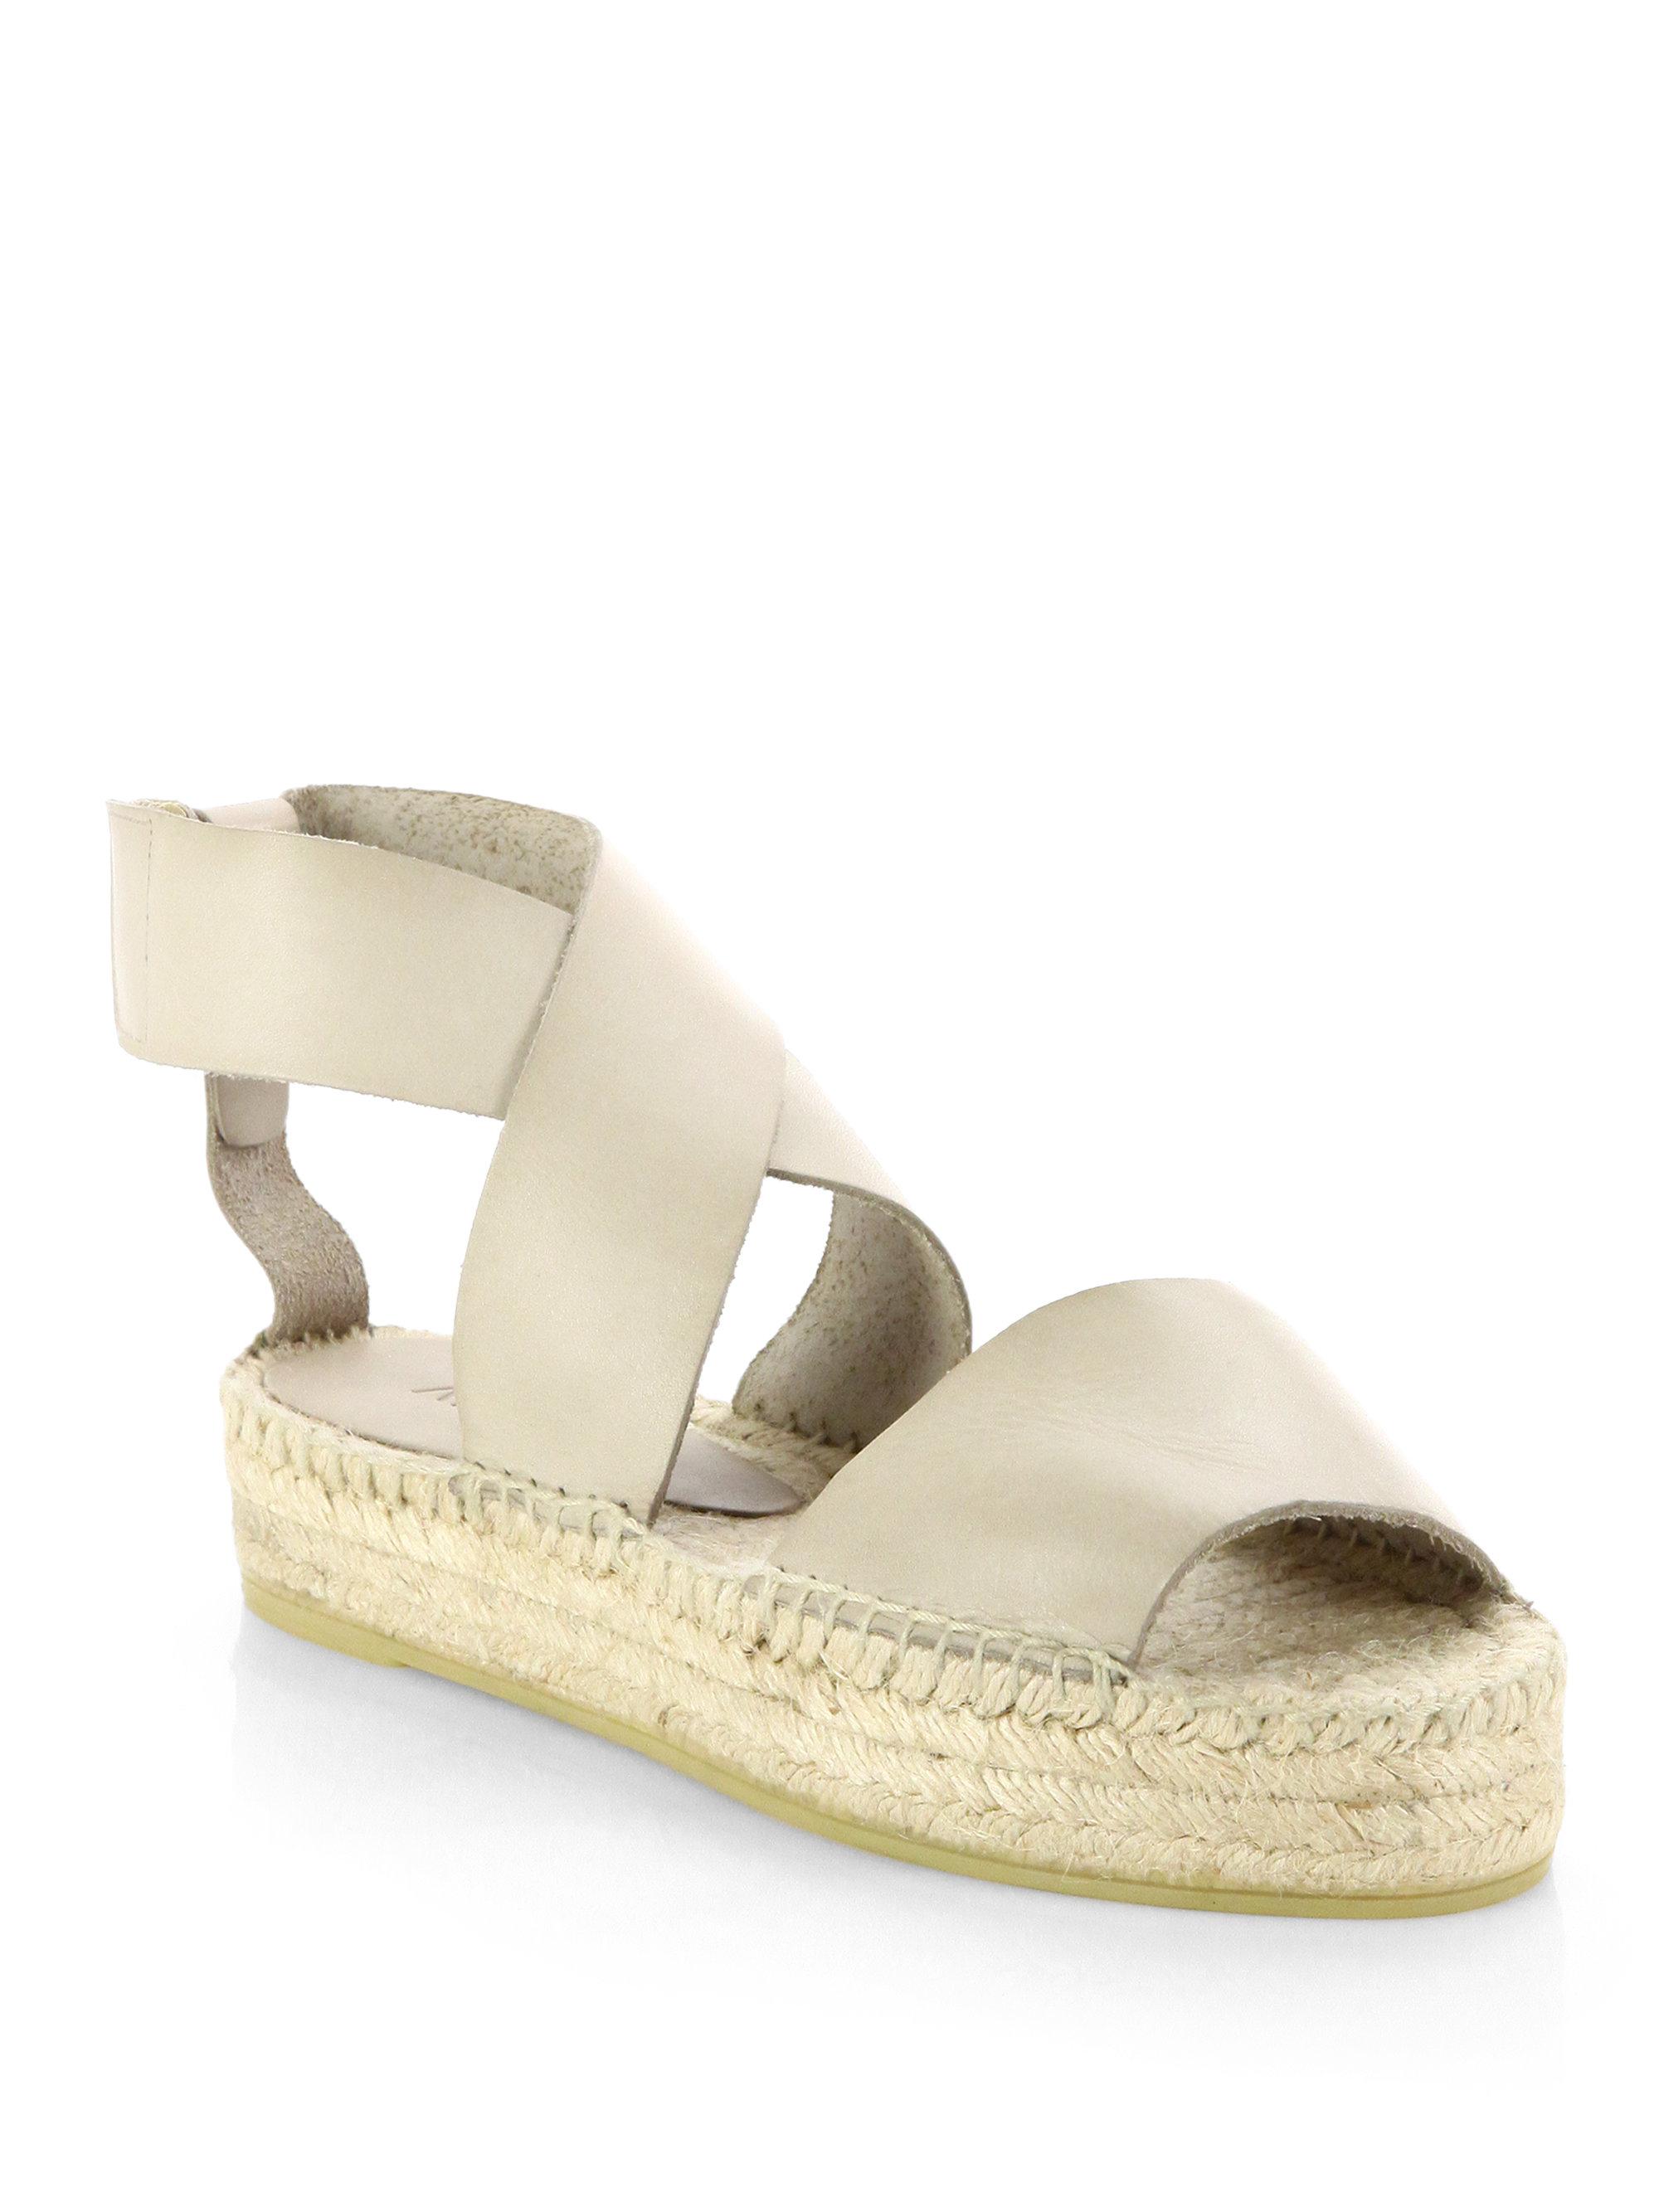 Vince Elise Leather Espadrille Sandals In Beige Luggage